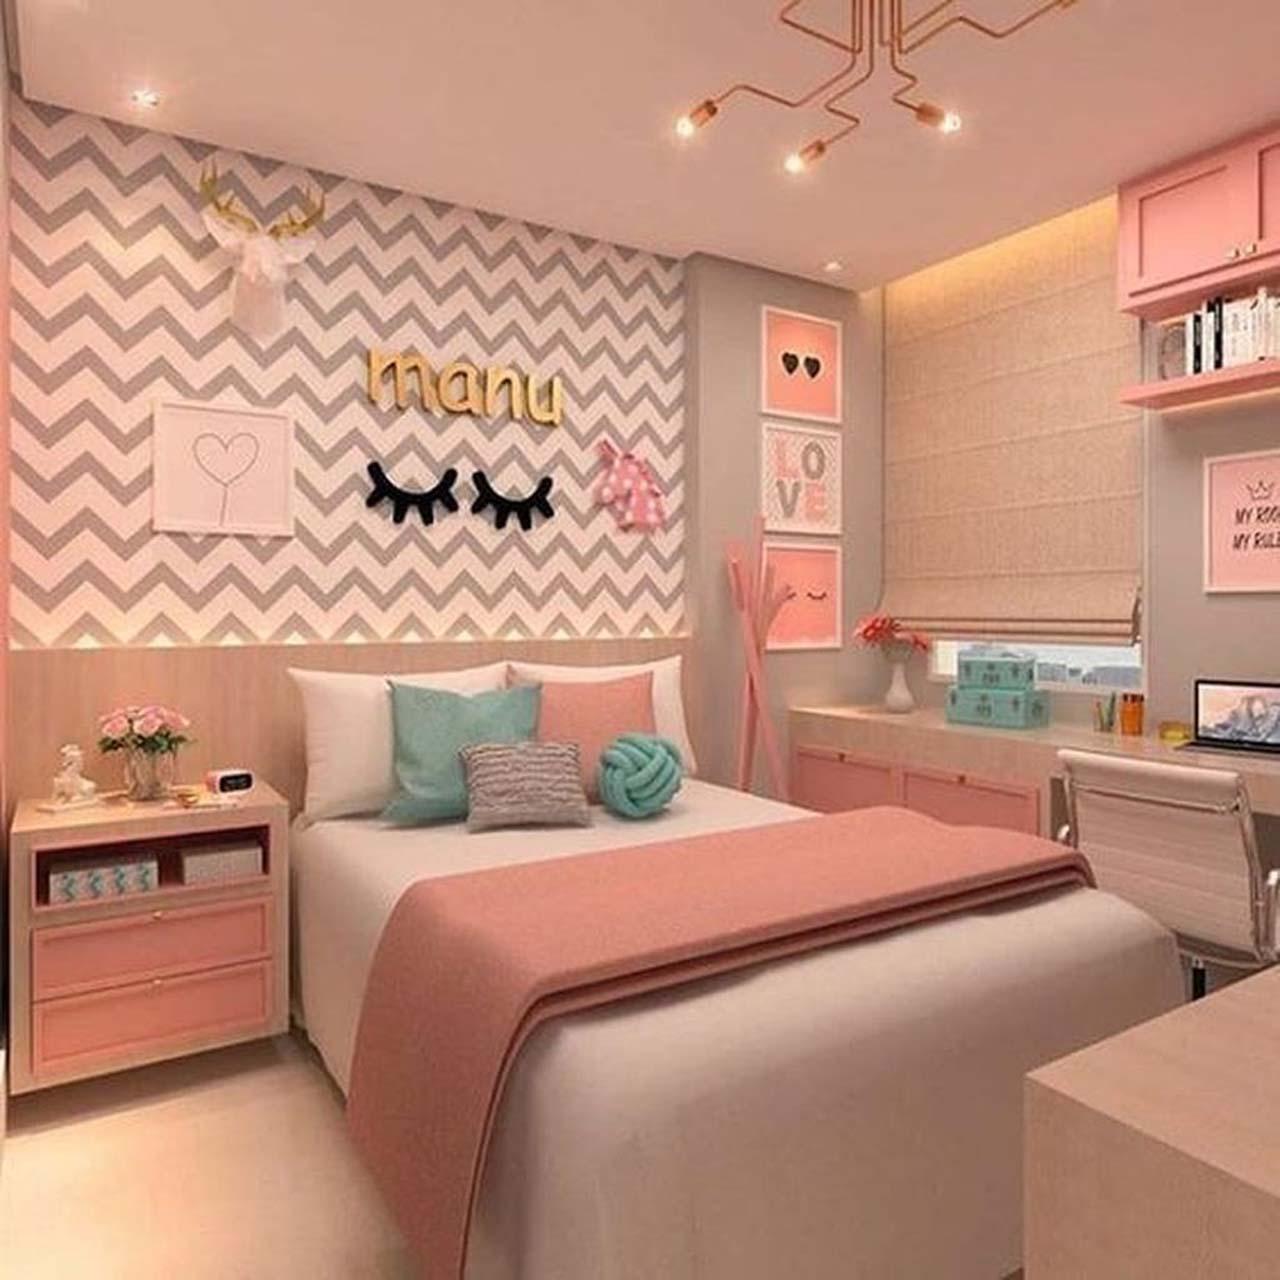 Diy Easy And Simple Bedroom Decoration Ideas My Decorative